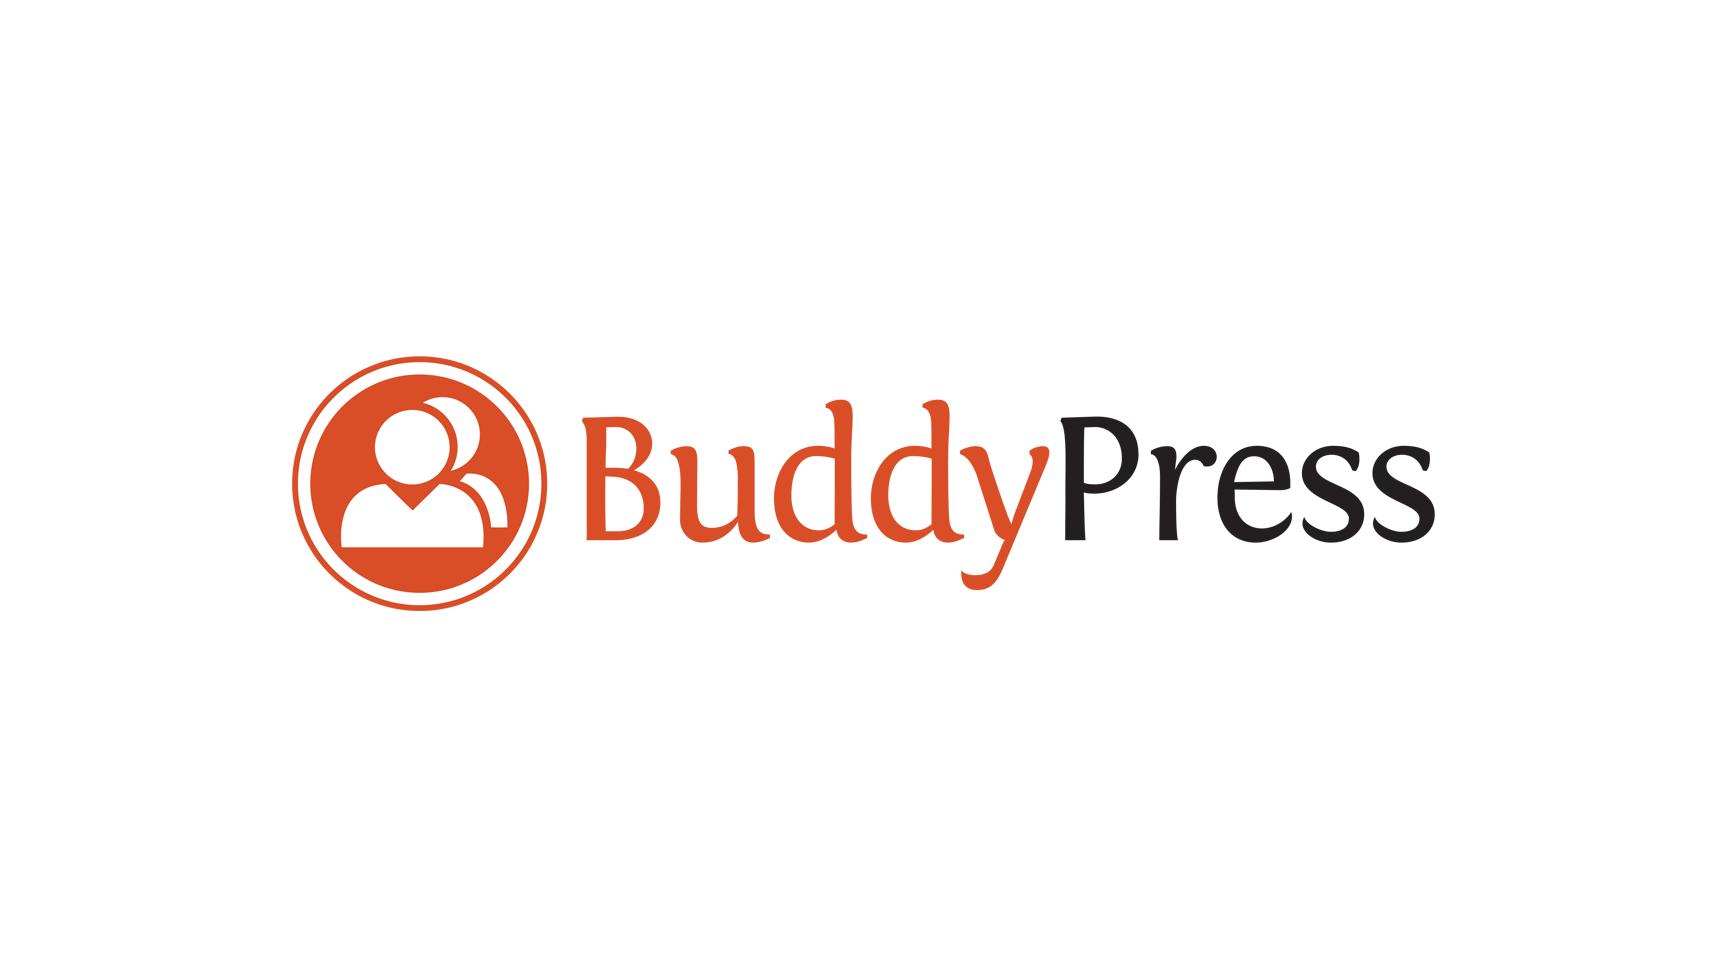 MemberPress – BuddyPress Integration